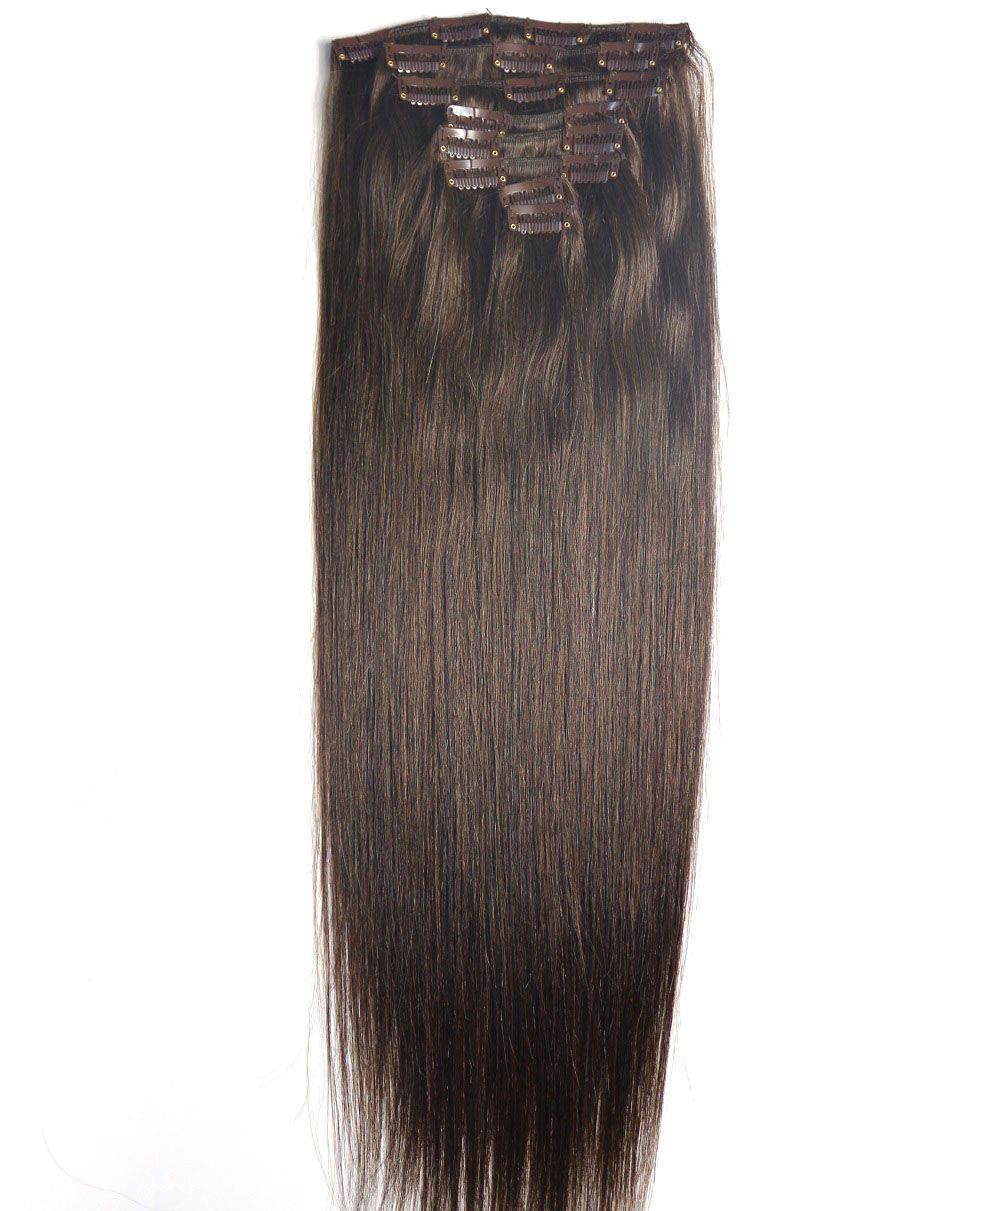 ZZHAIR 100g-160g 16-26 Machine Made Remy Hair <font><b>8Pcs</b></font> Set Clips In 100% Human Hair Extensions Full Head Set Straight Natural Hair